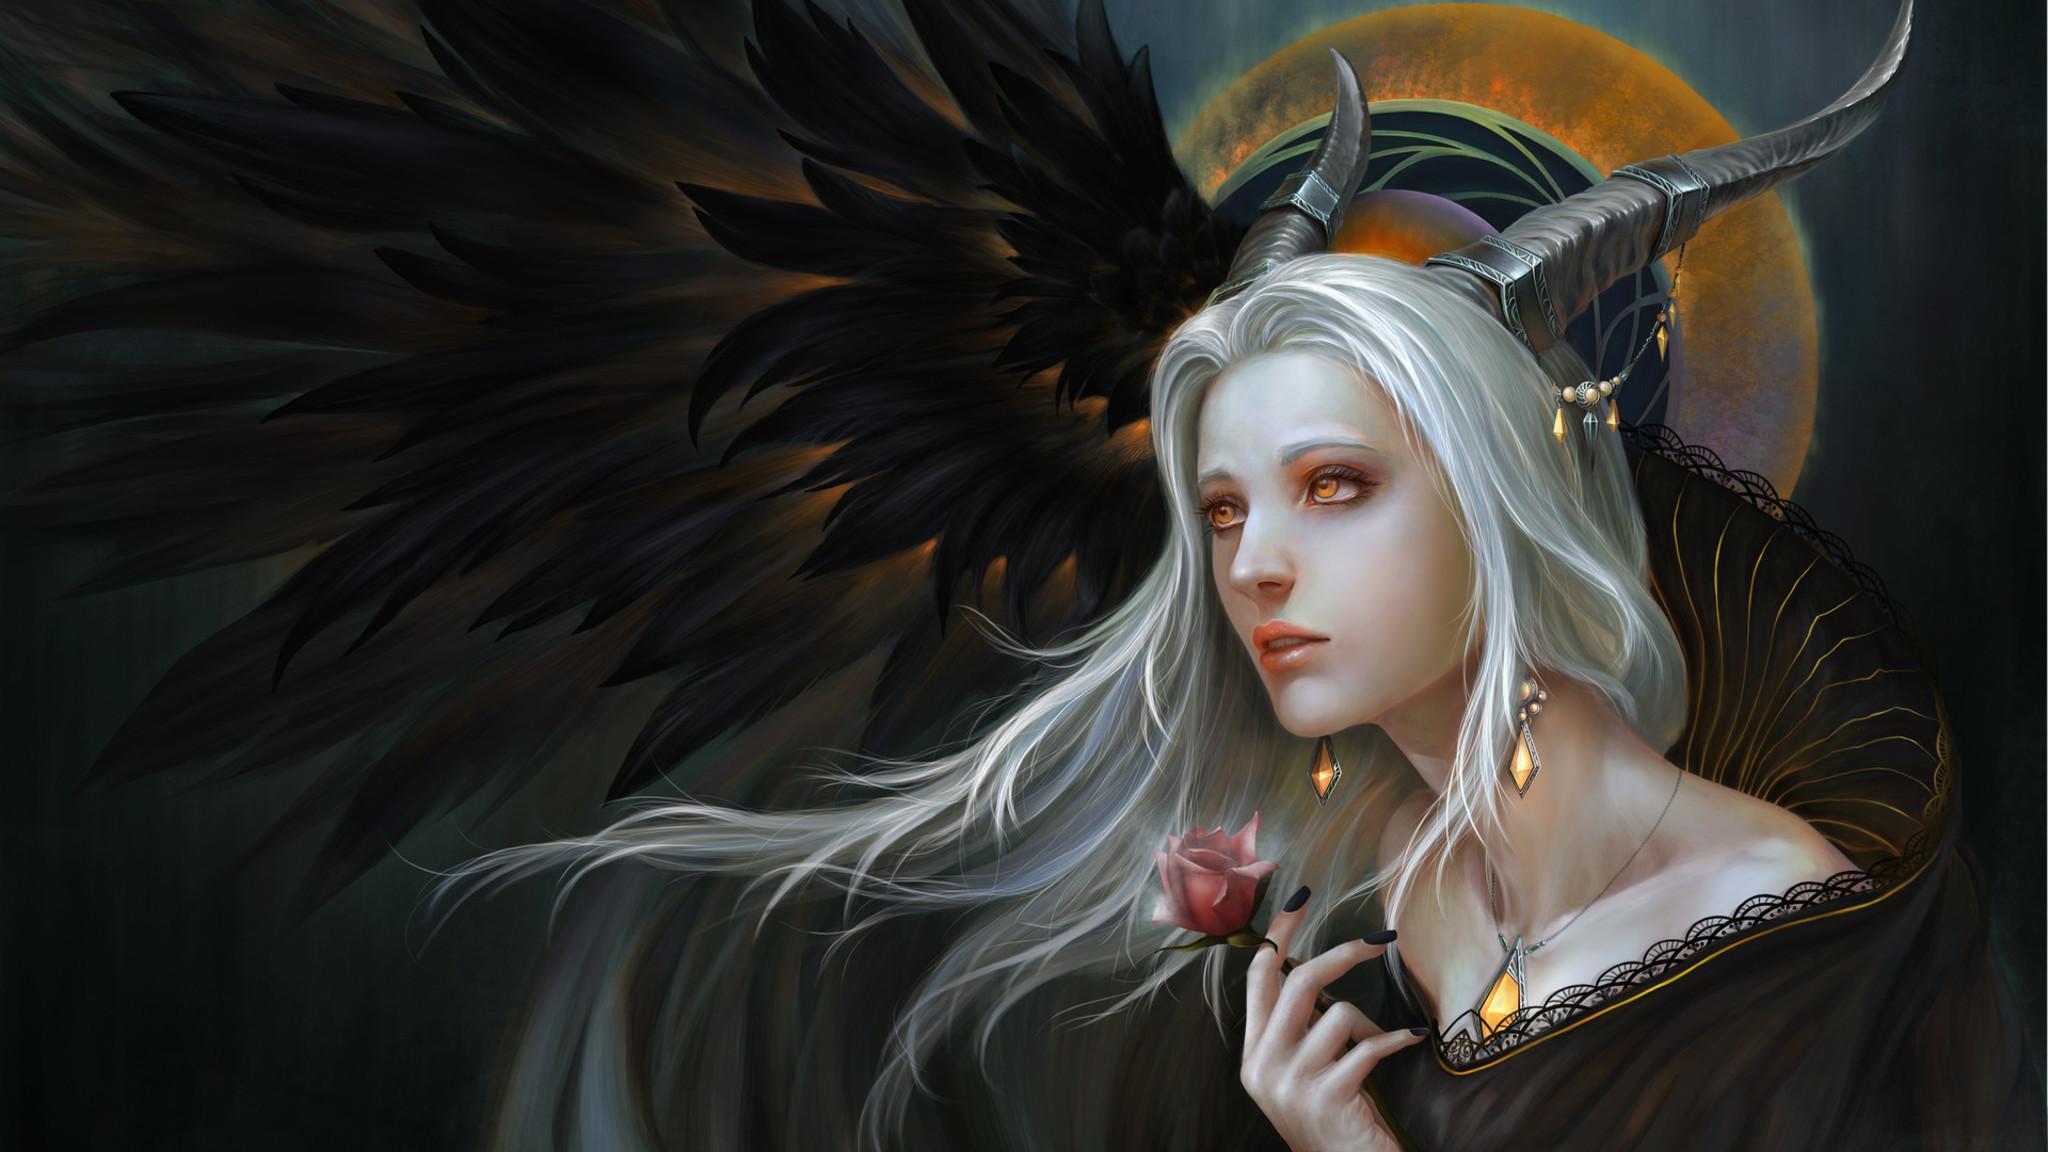 Res: 2048x1152, demon-fantasy-to.jpg